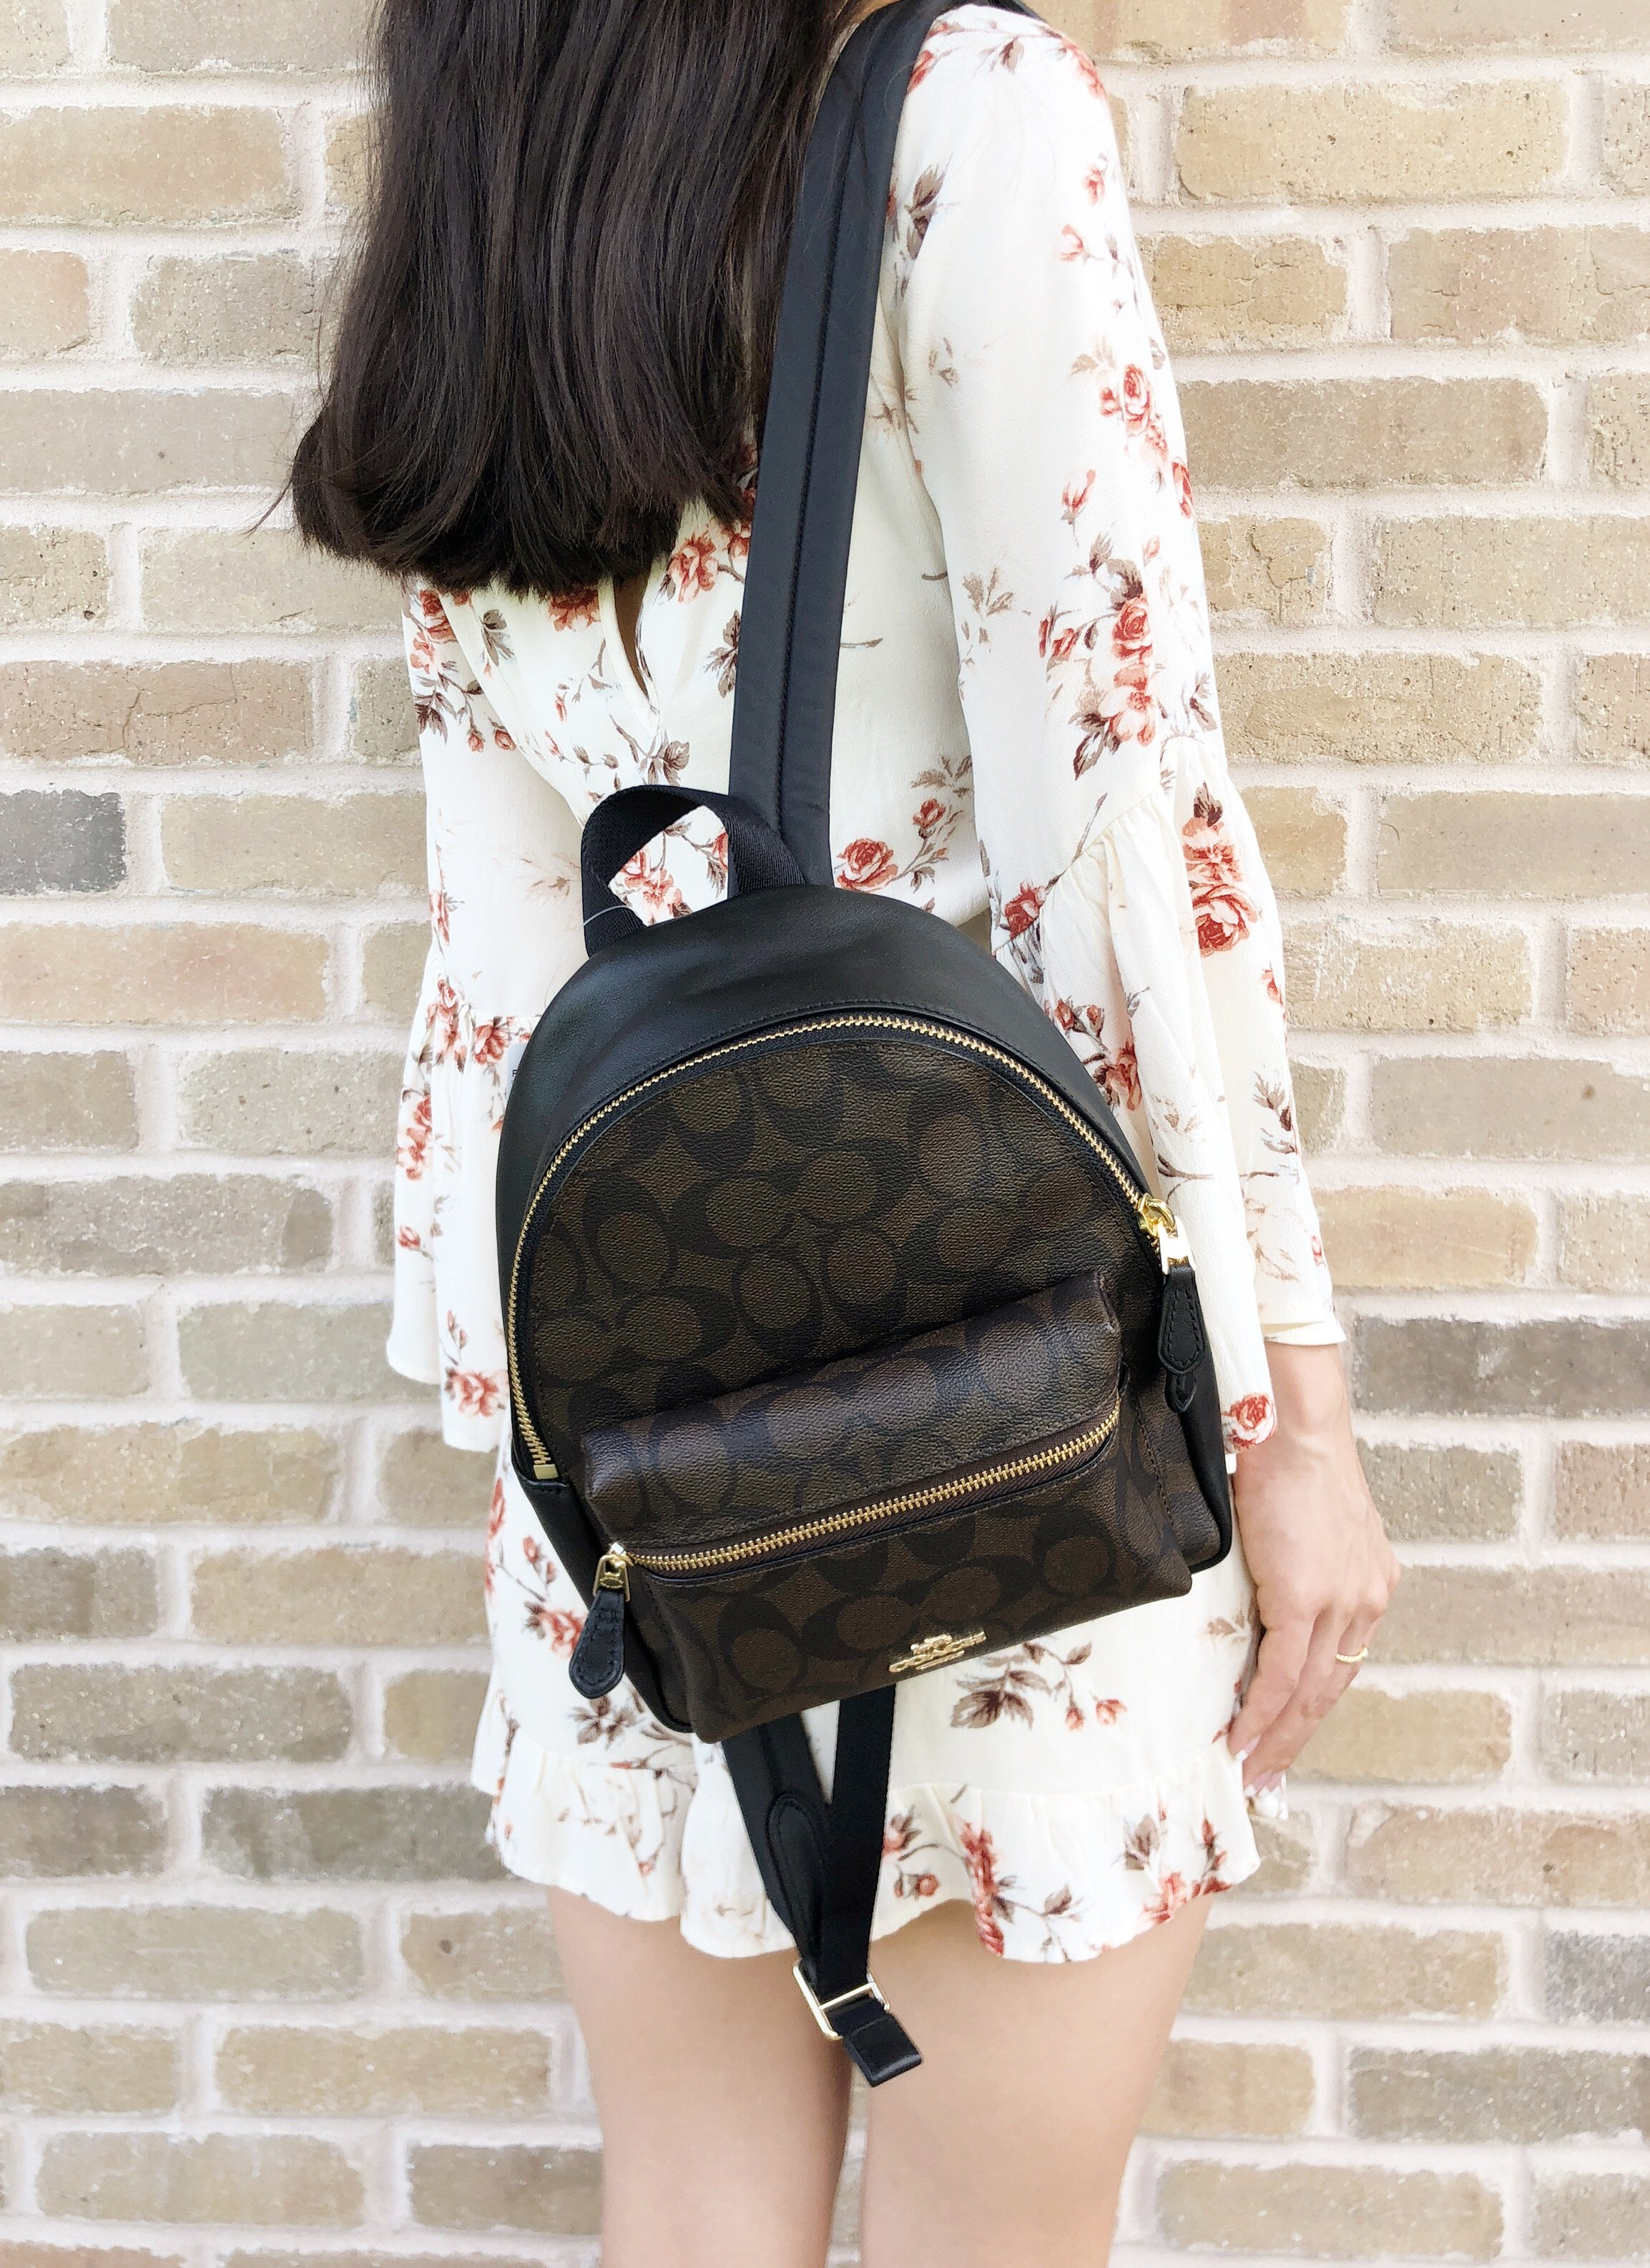 c012139ab Coach F58315 Mini Charlie Signature Backpack Bag Brown Black #GabysBags # Handbags